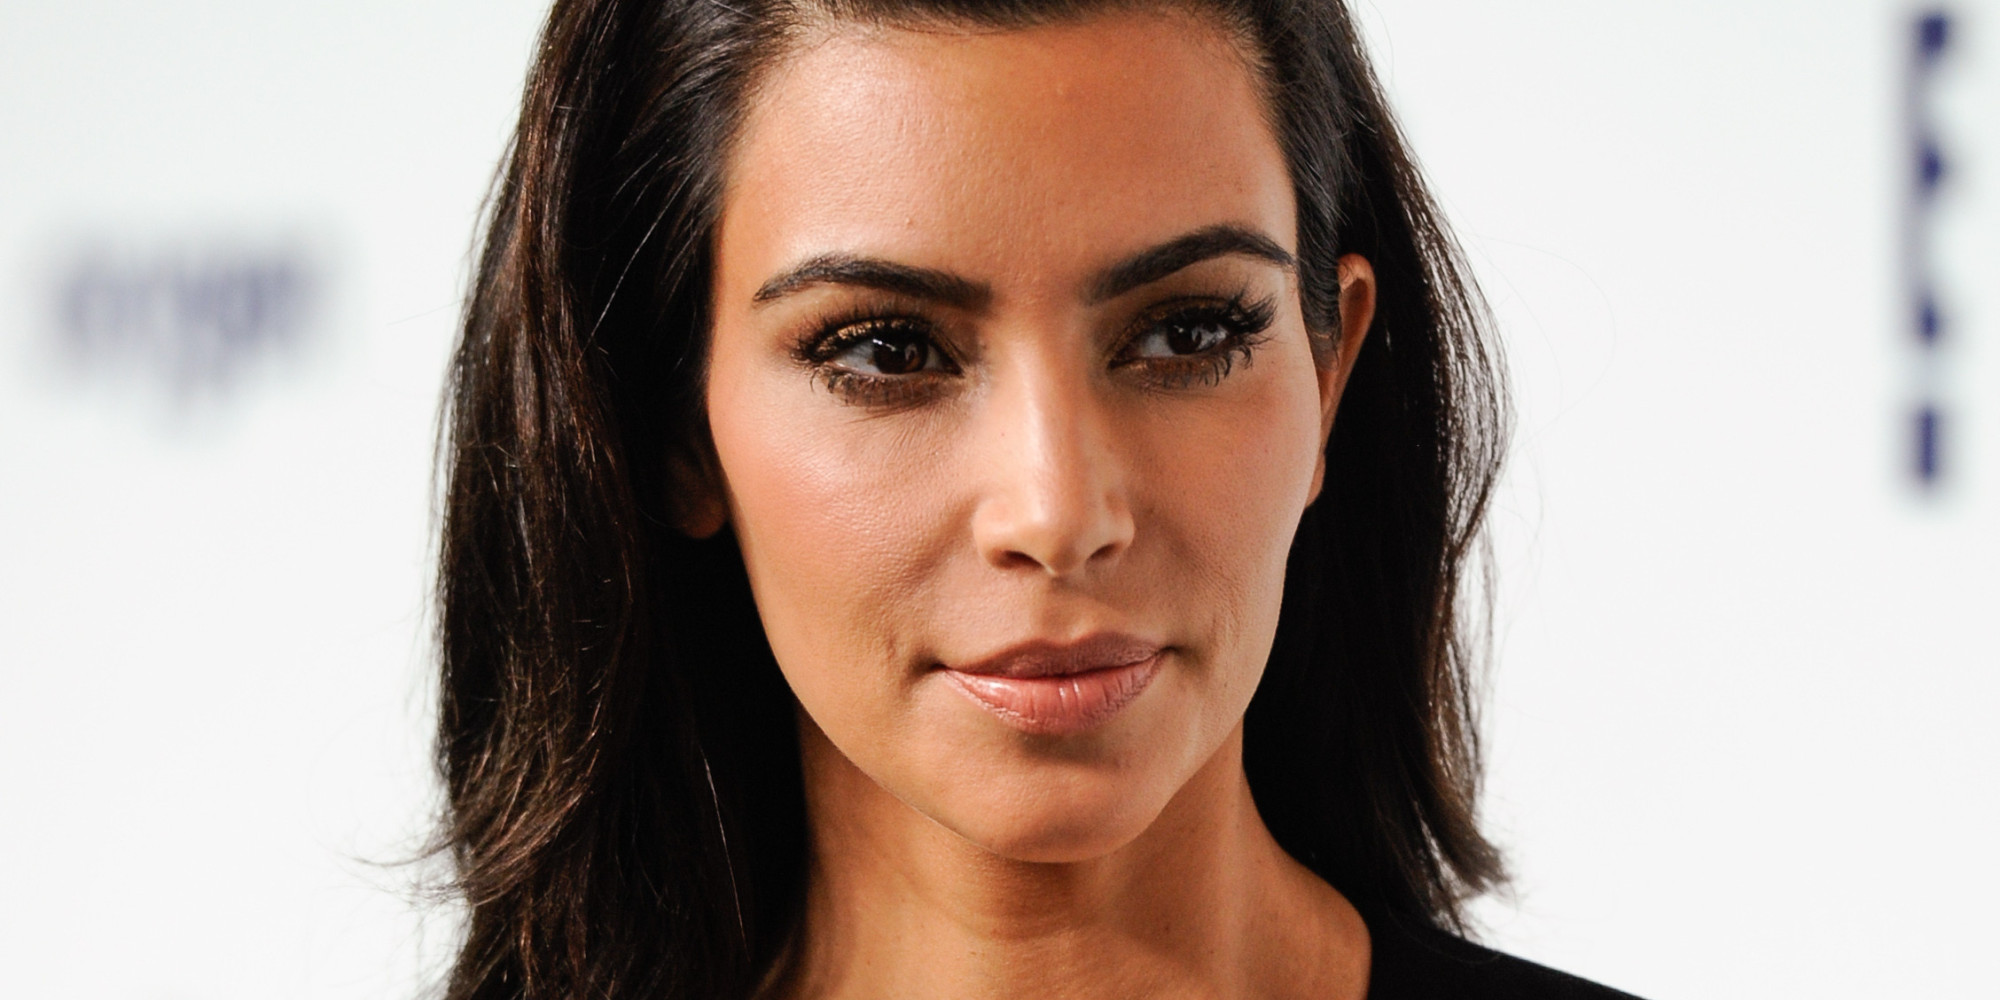 Kim Kardashian's Non-Surgical Wedding Makeover Secrets Revealed ... Kim Kardashian